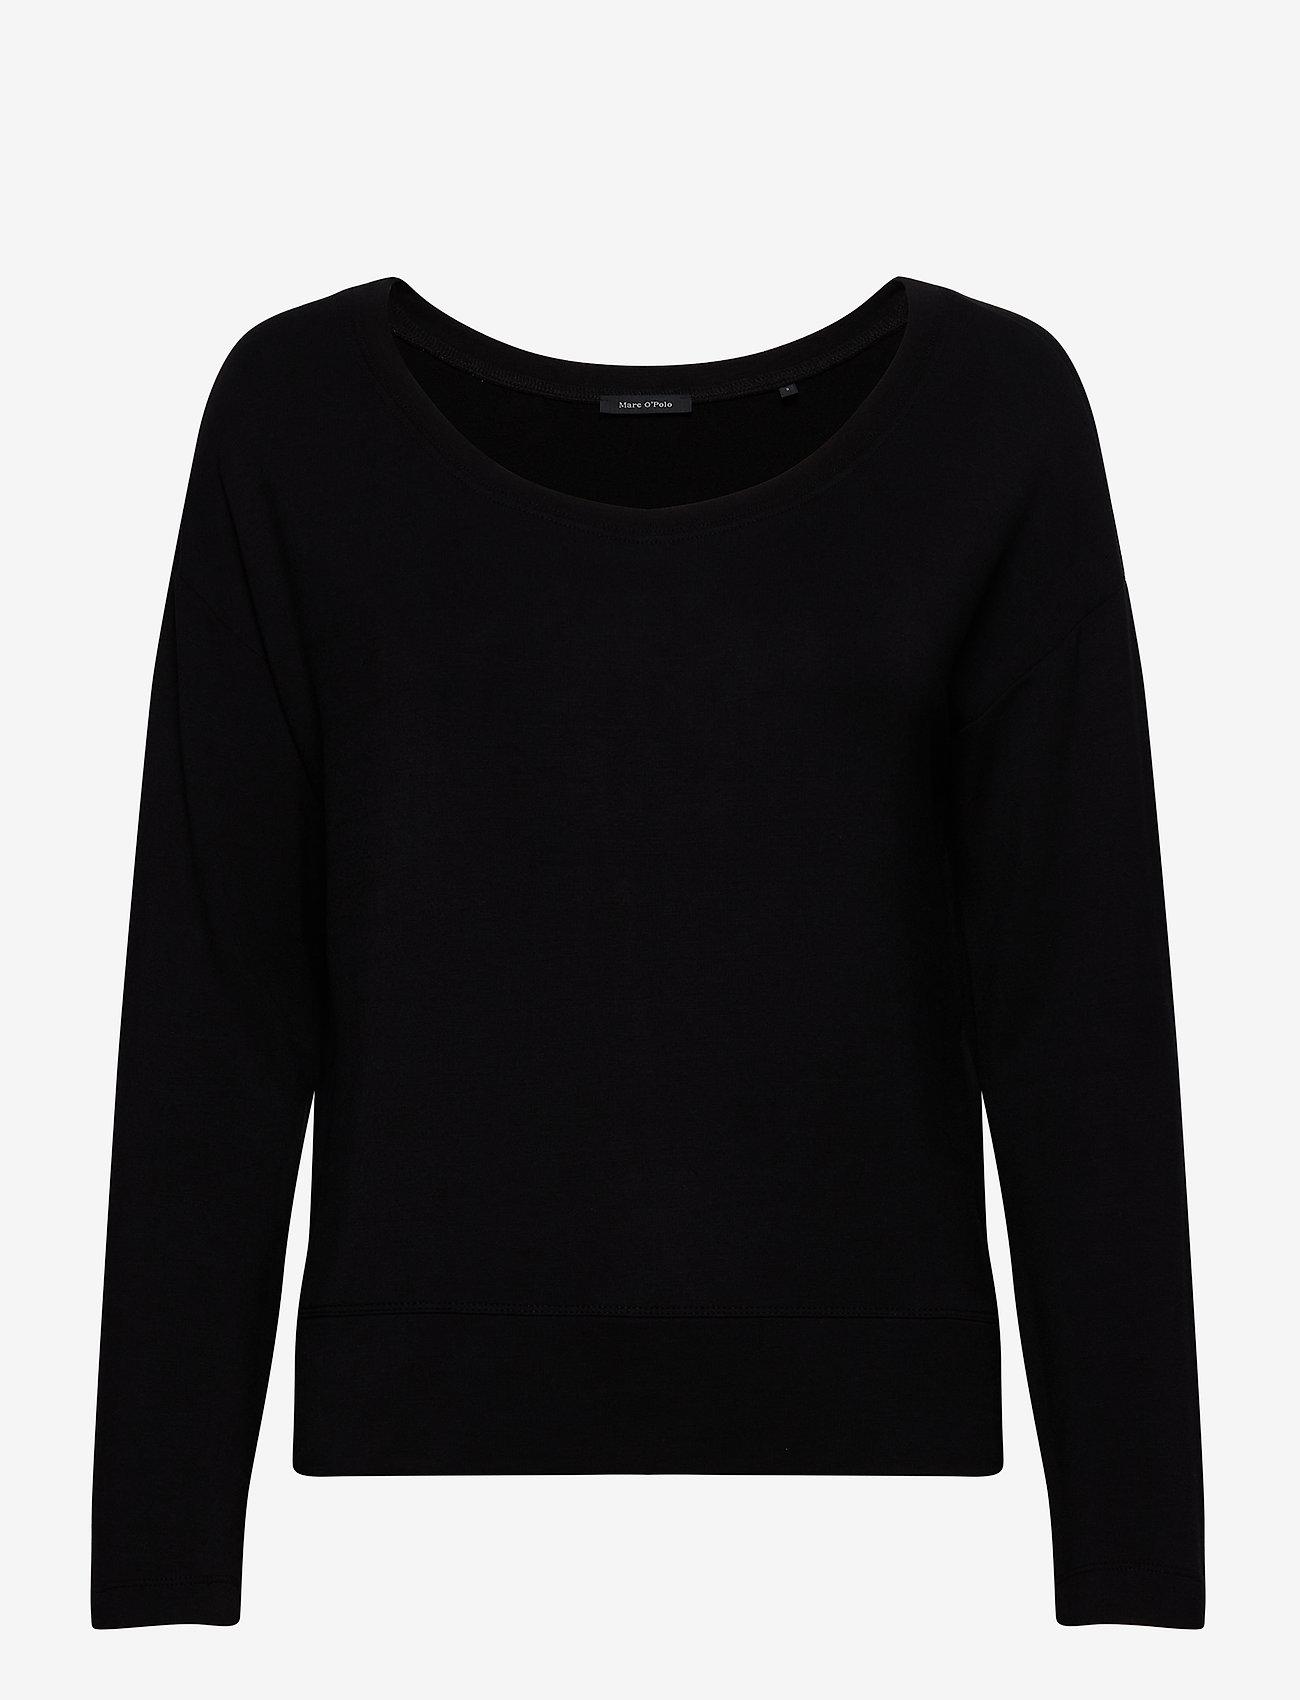 Marc O'Polo - SWEATSHIRTS - sweatshirts - black - 0